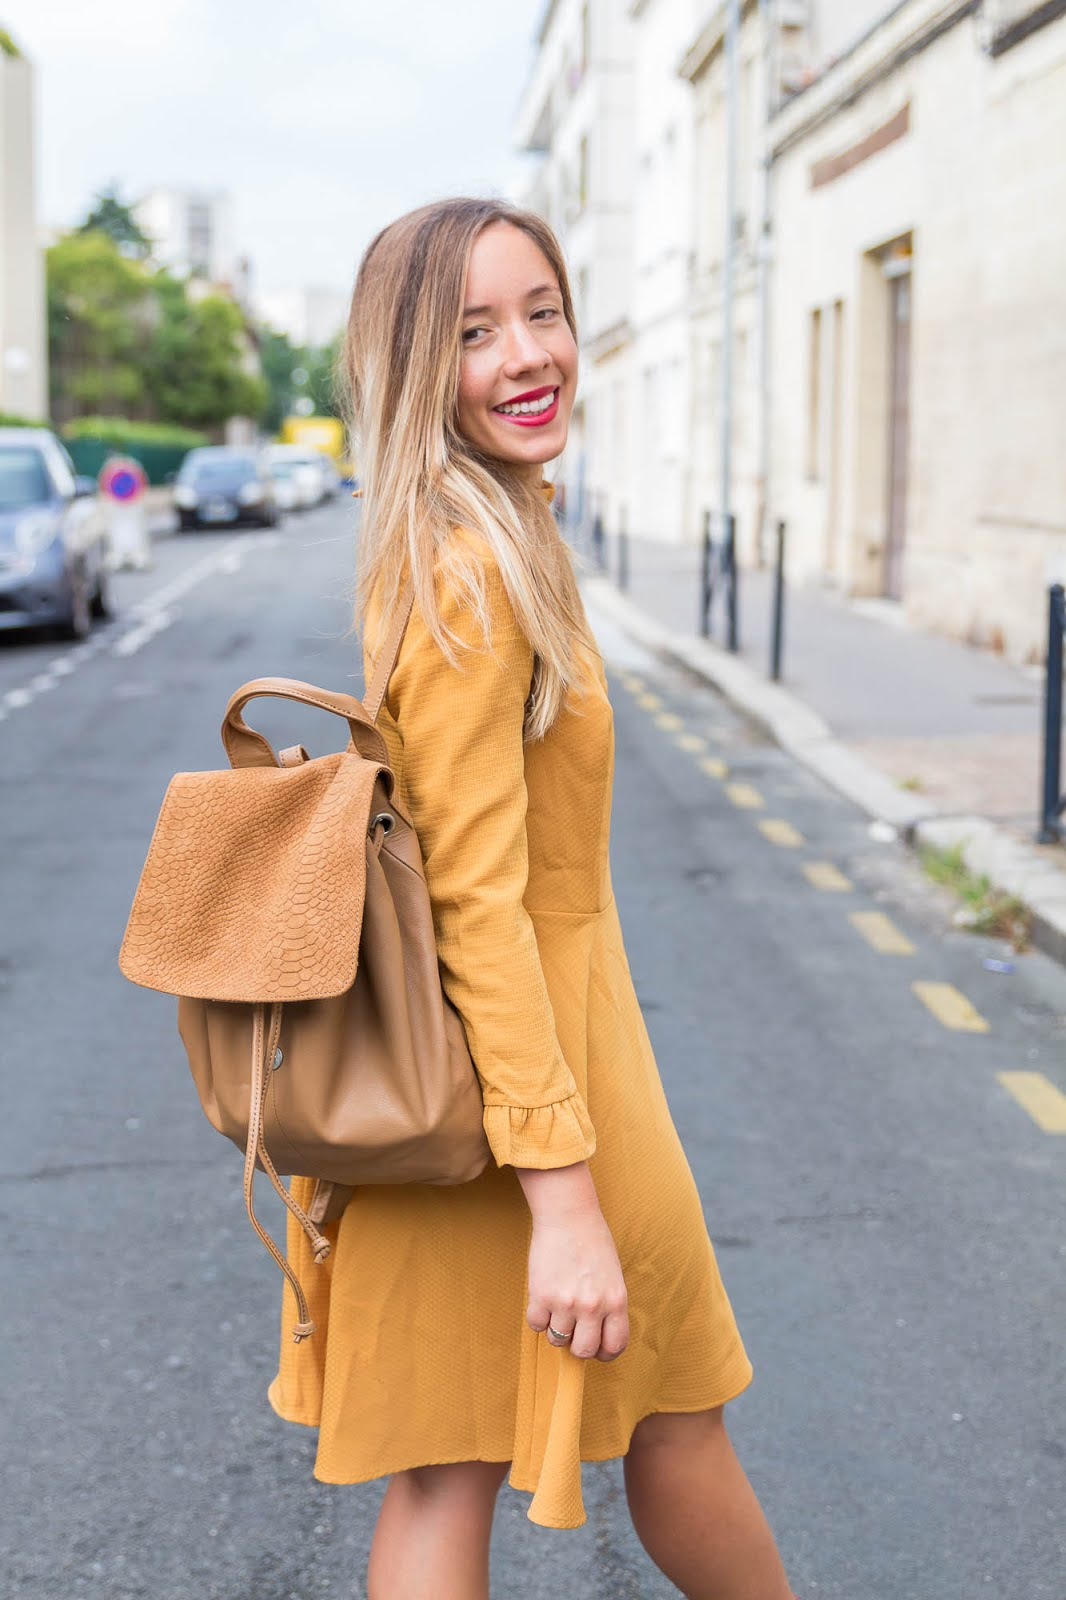 robe jaune moutarde automne